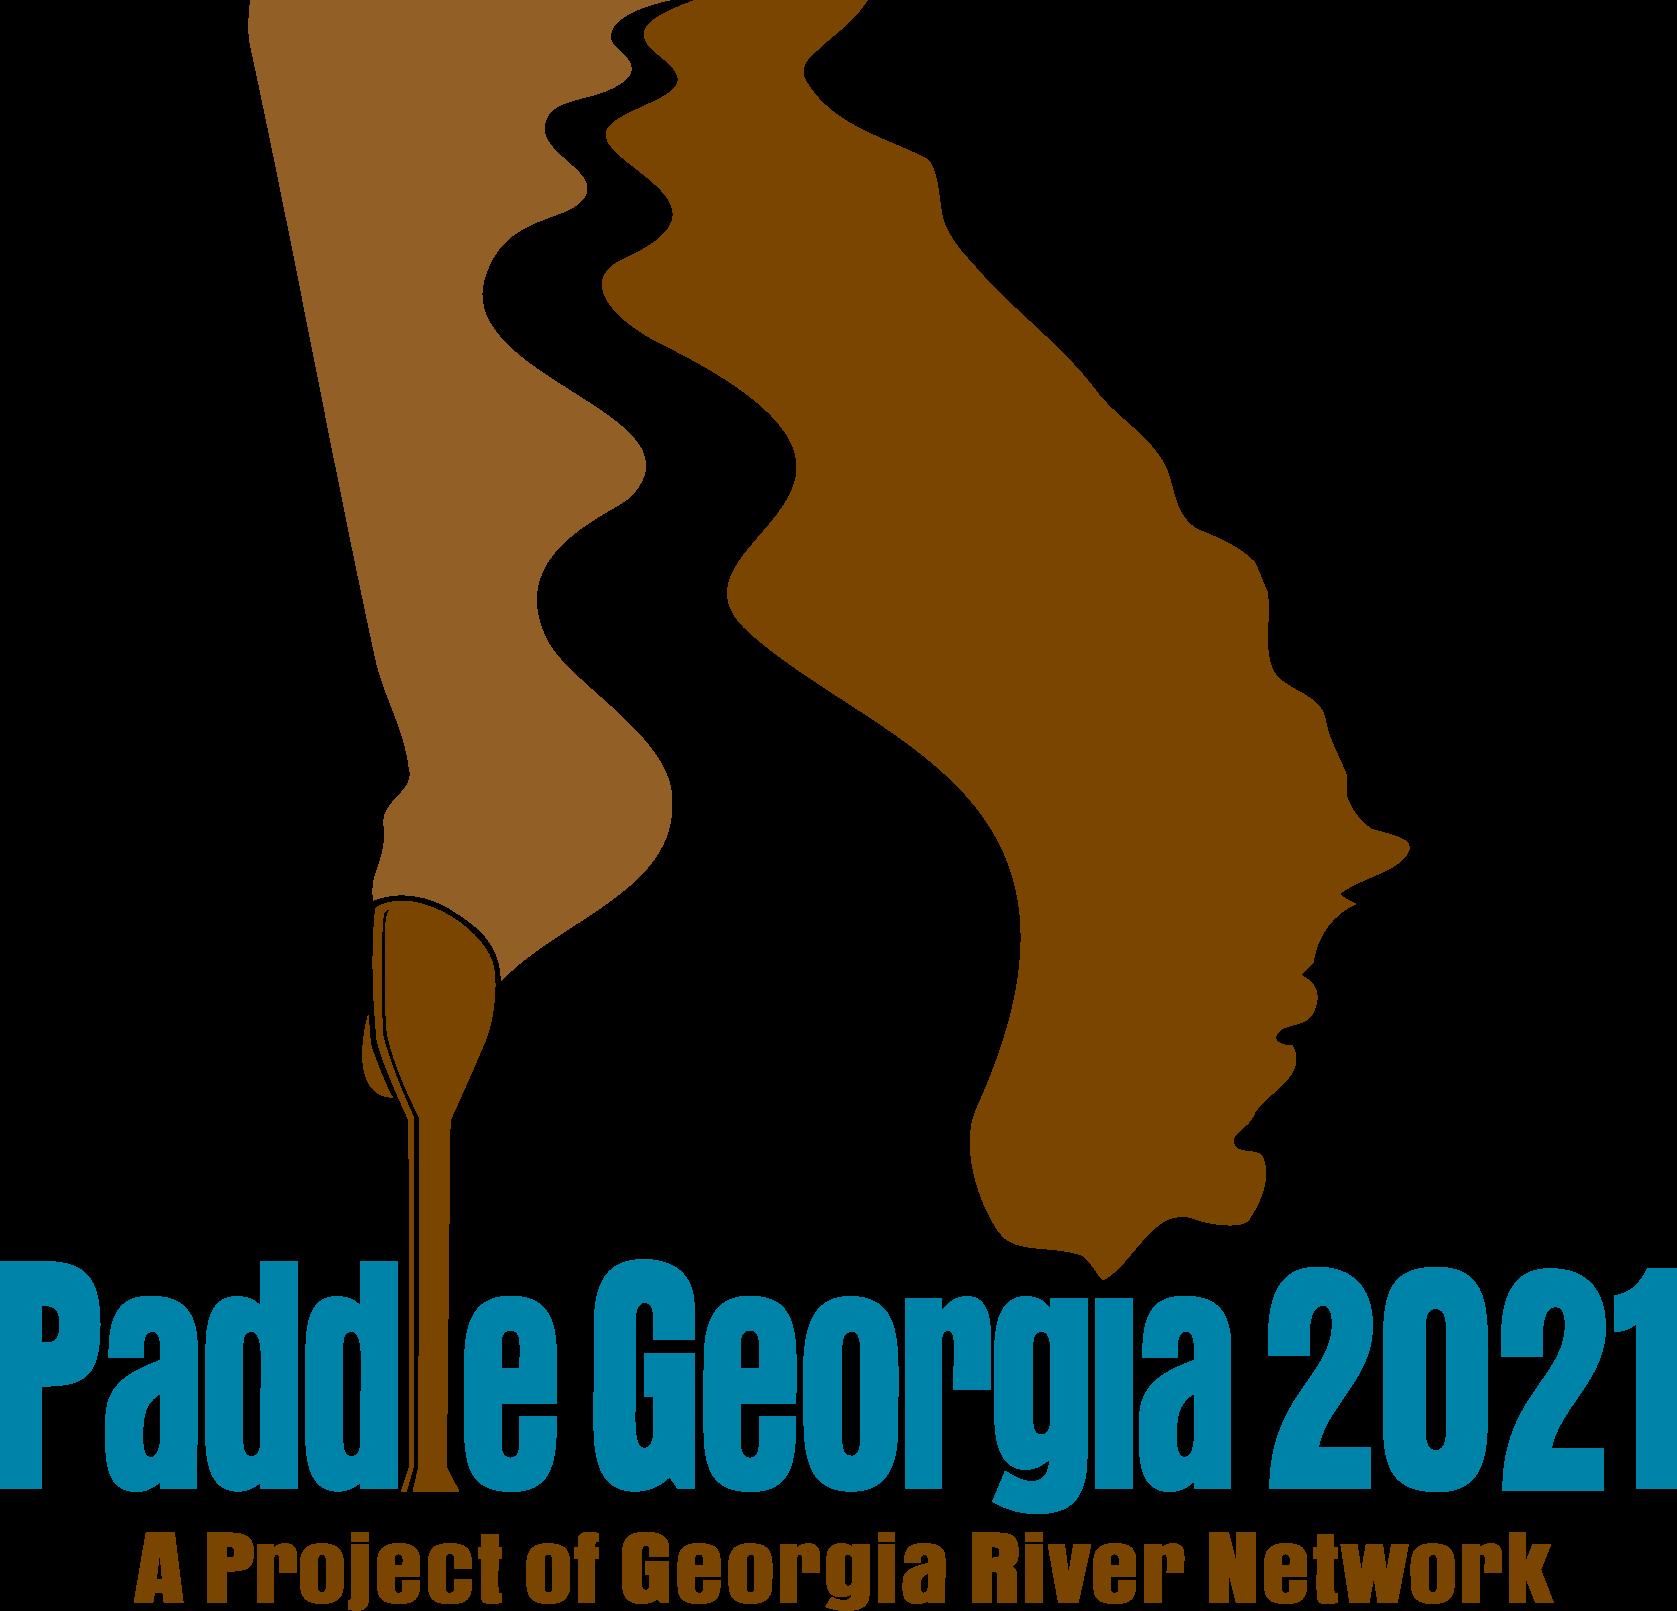 Paddle Georgia 2021 Flint River